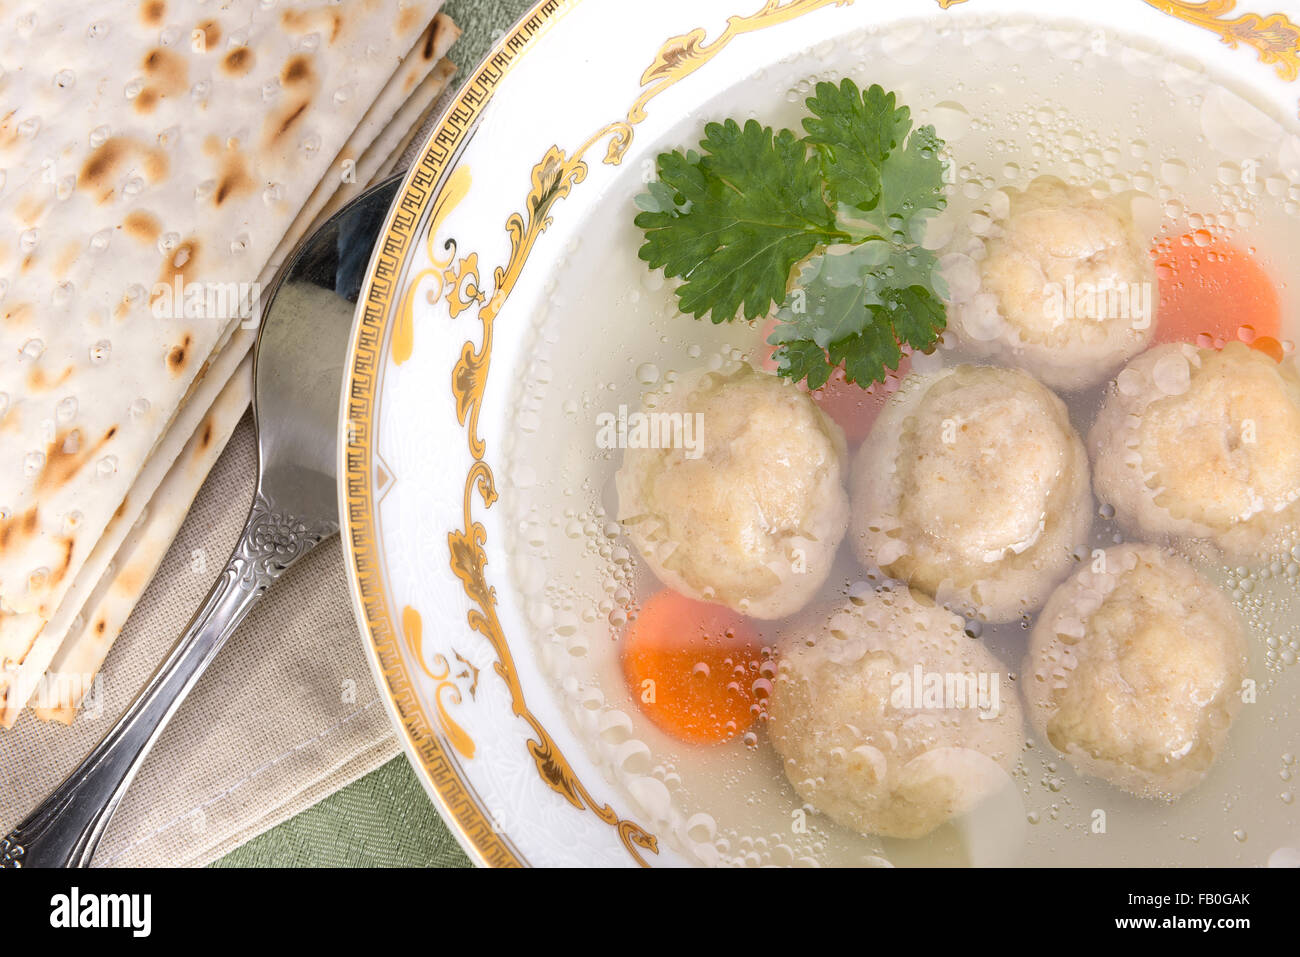 cuisine yiddish ashkénaze